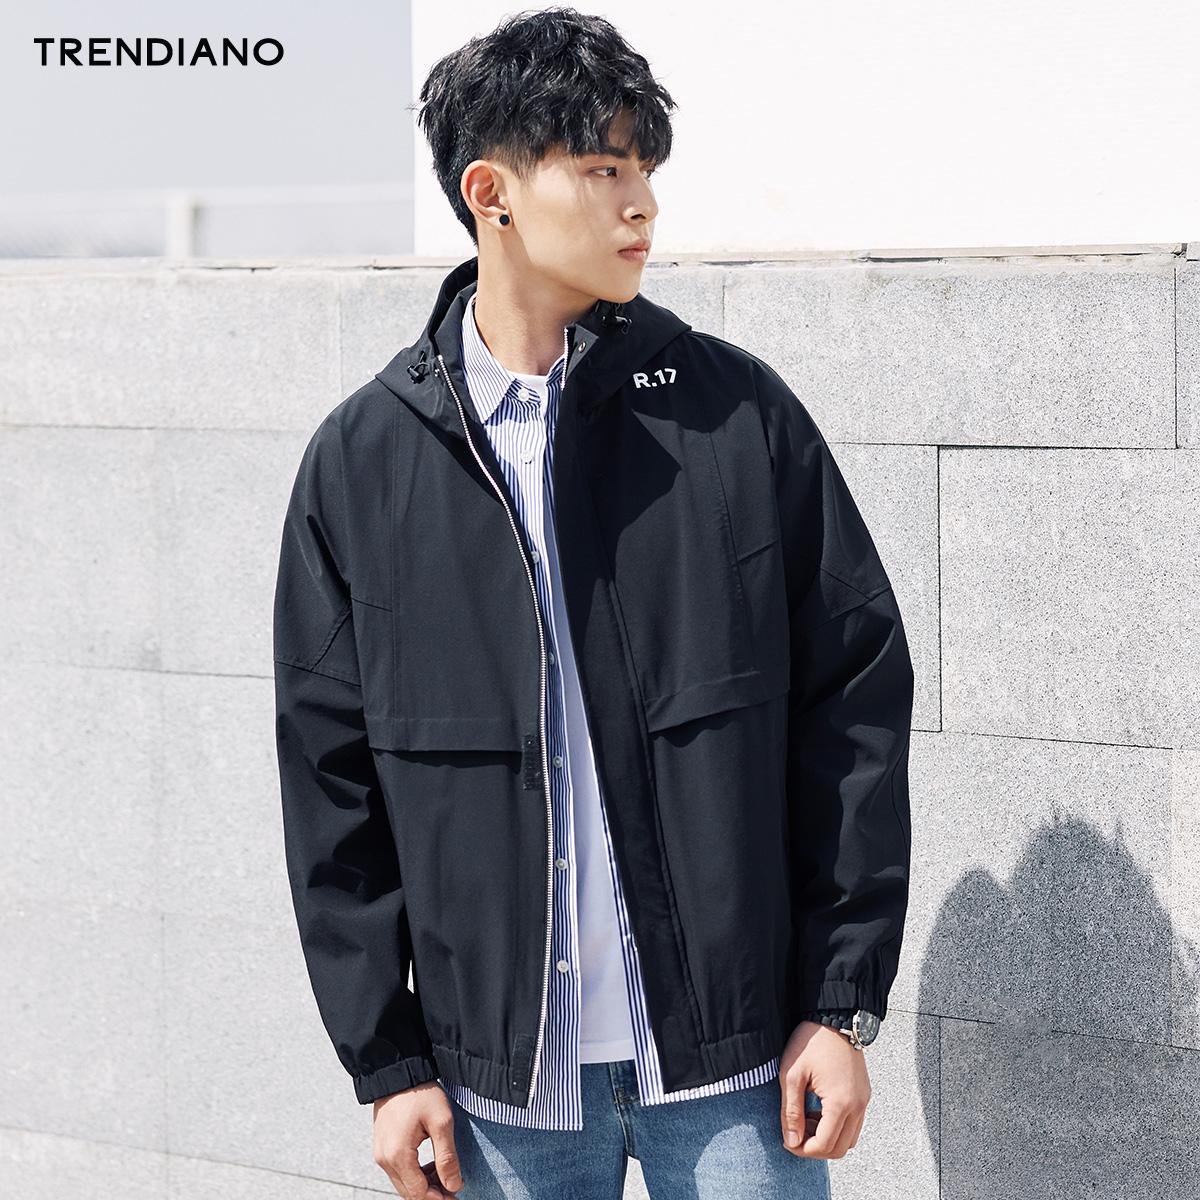 TRENDIANO新2018男装春装潮简约印花字母连帽风衣外套3GC104453P